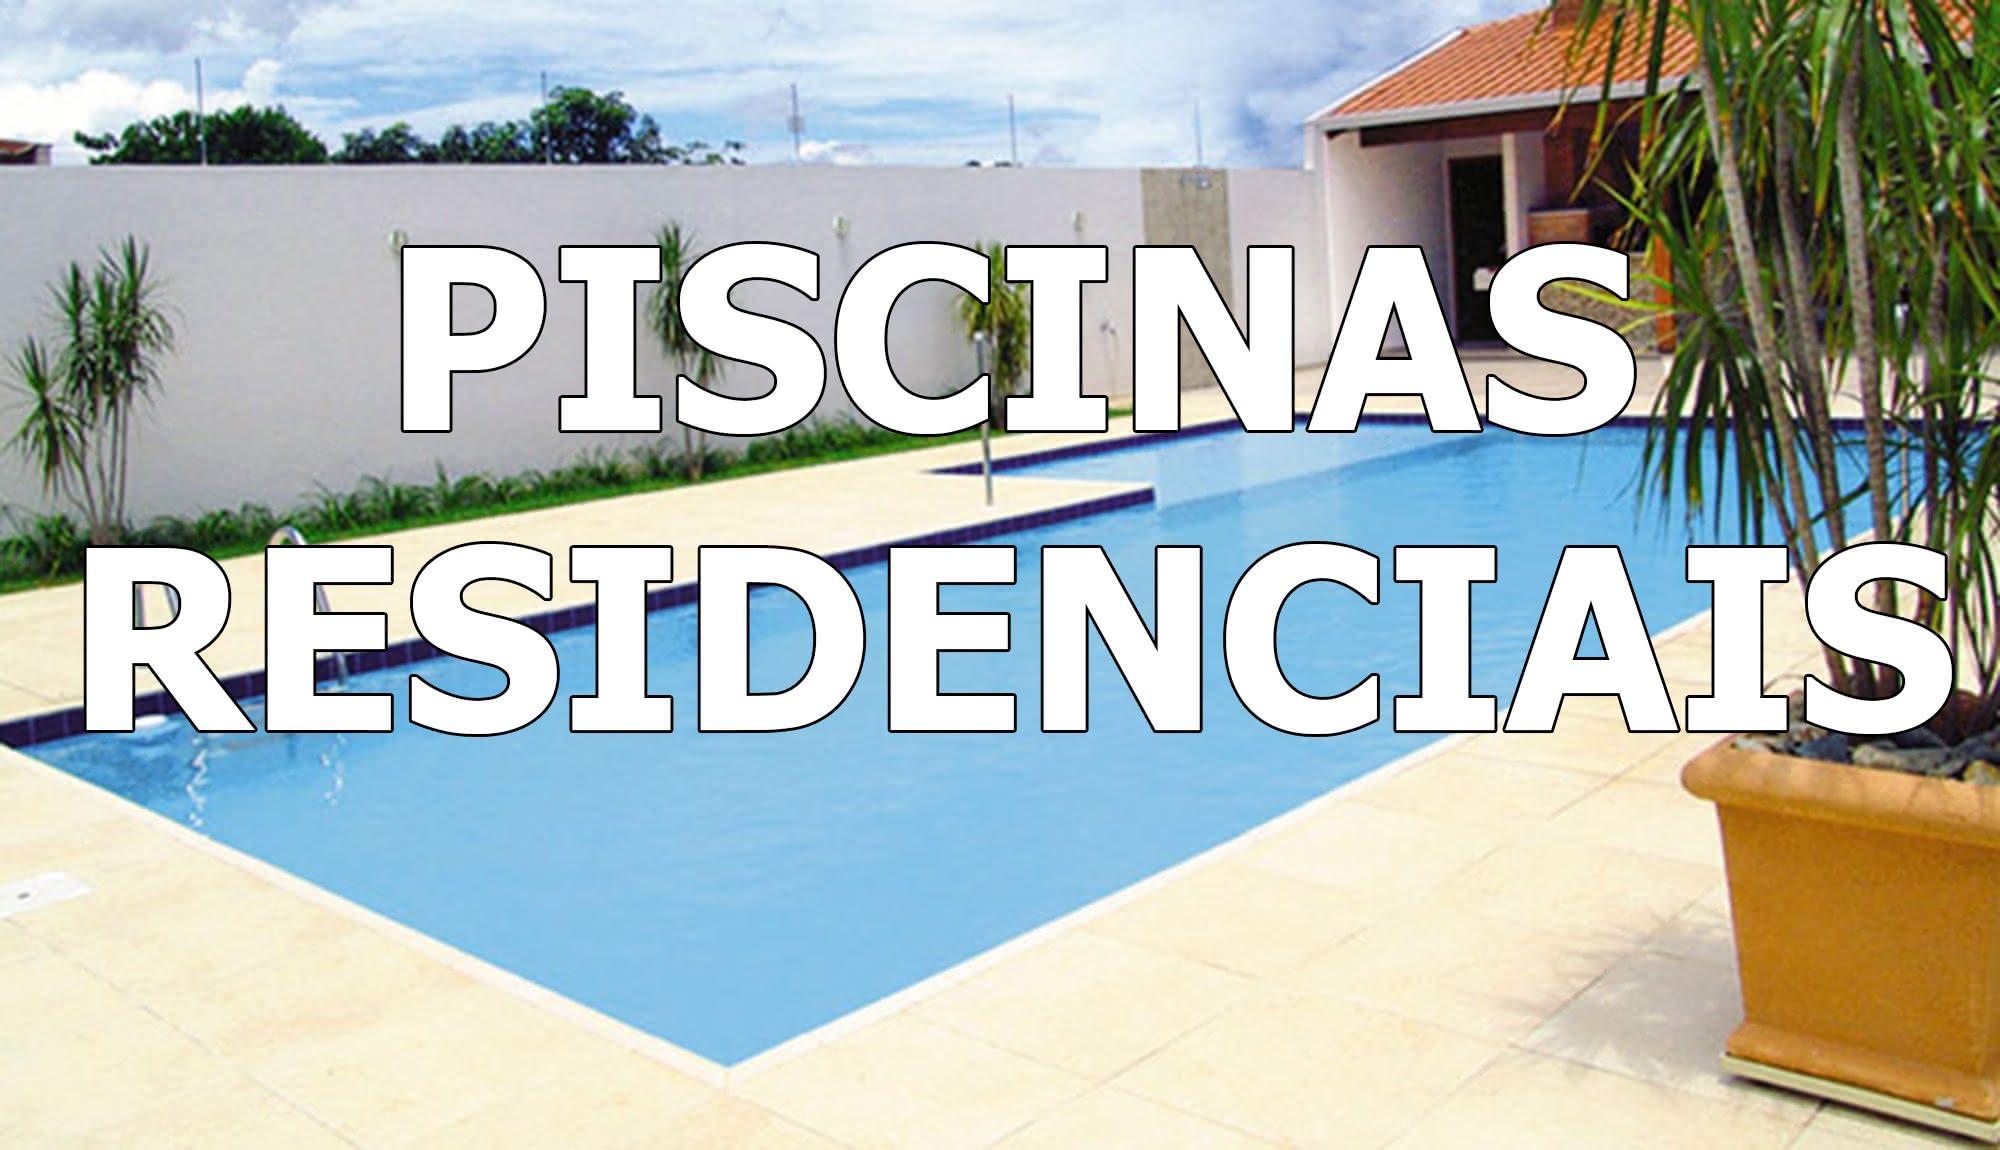 Piscinas Residenciais